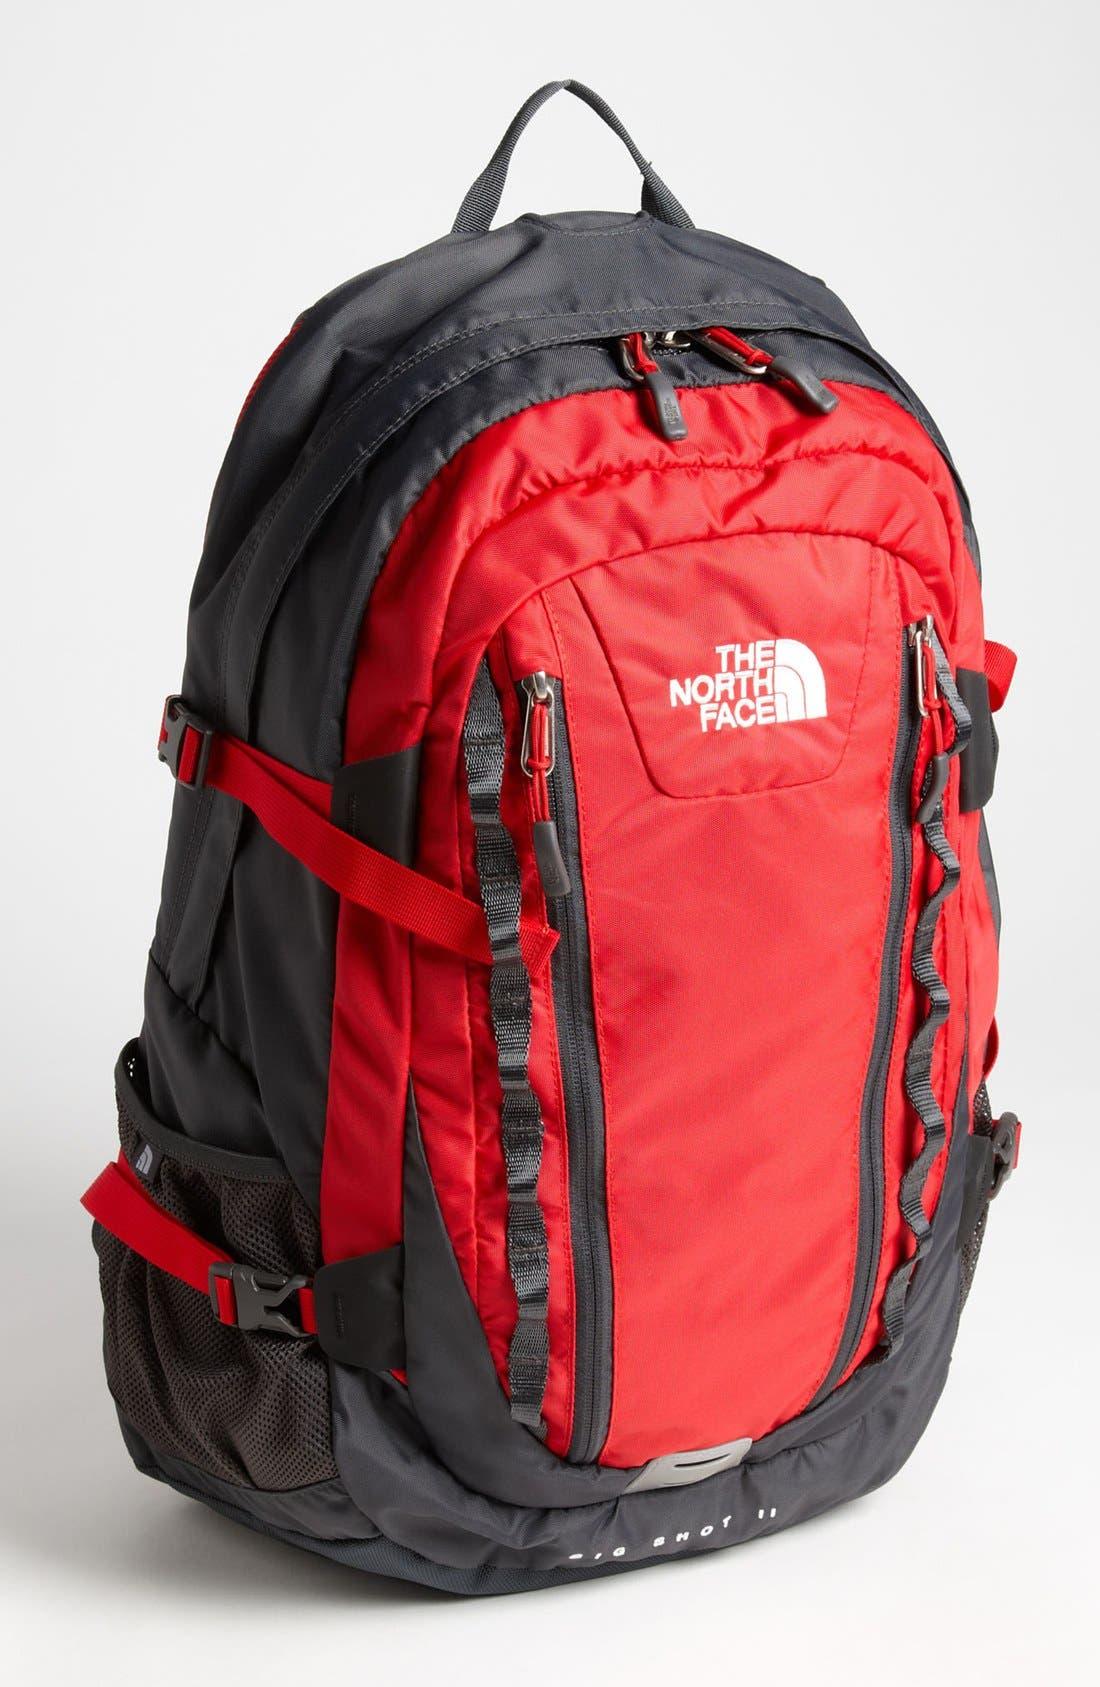 Alternate Image 1 Selected - The North Face 'Big Shot II' Backpack